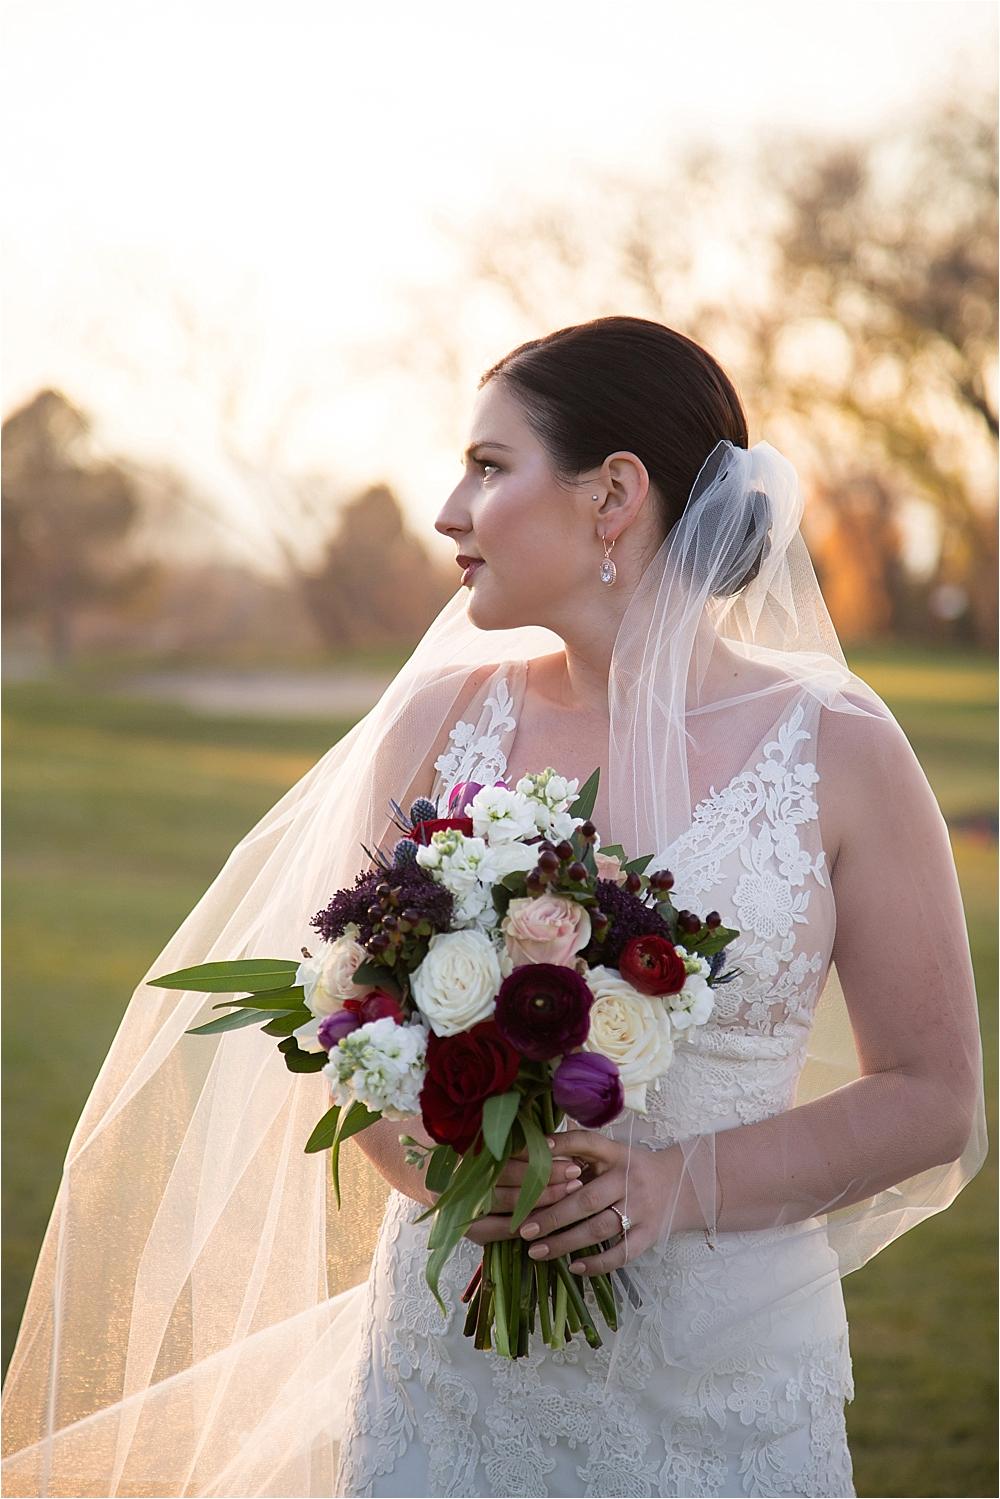 Lynsee + Deryk's Raccoon Creek Wedding_0028.jpg